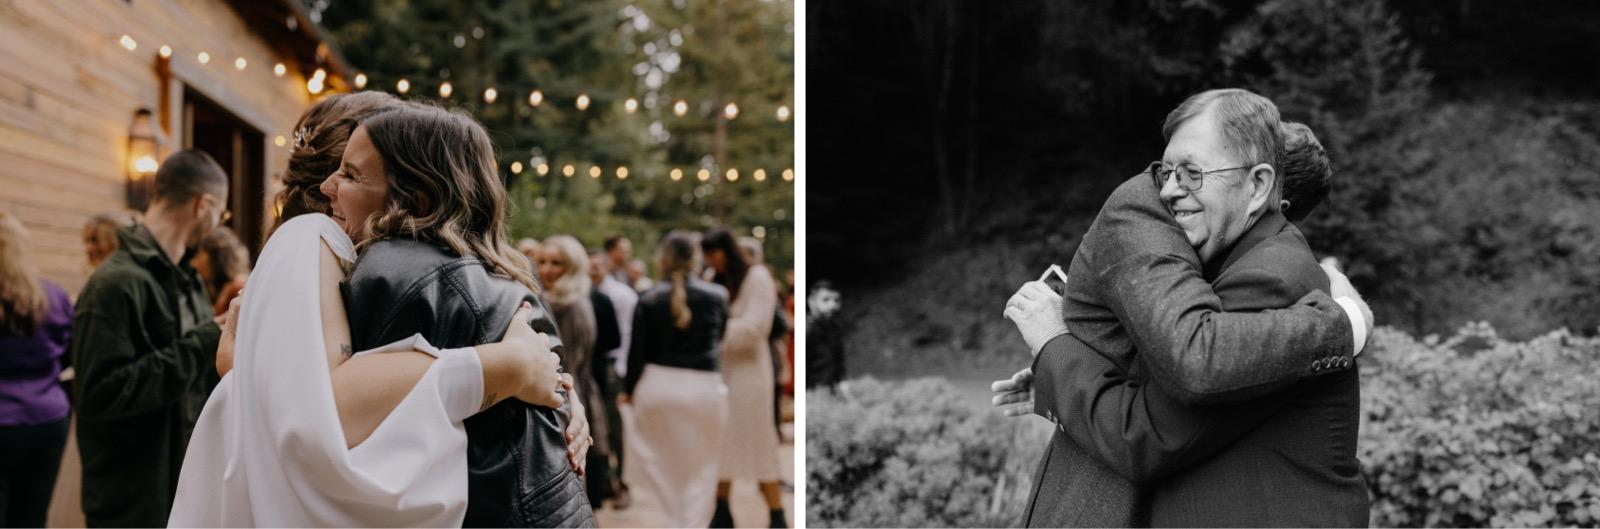 101_Emily & Jeff Wedding 0896_Emily & Jeff Wedding 0895_the-waterfall-lodge_forest_wedding_ben-lomond_intimate